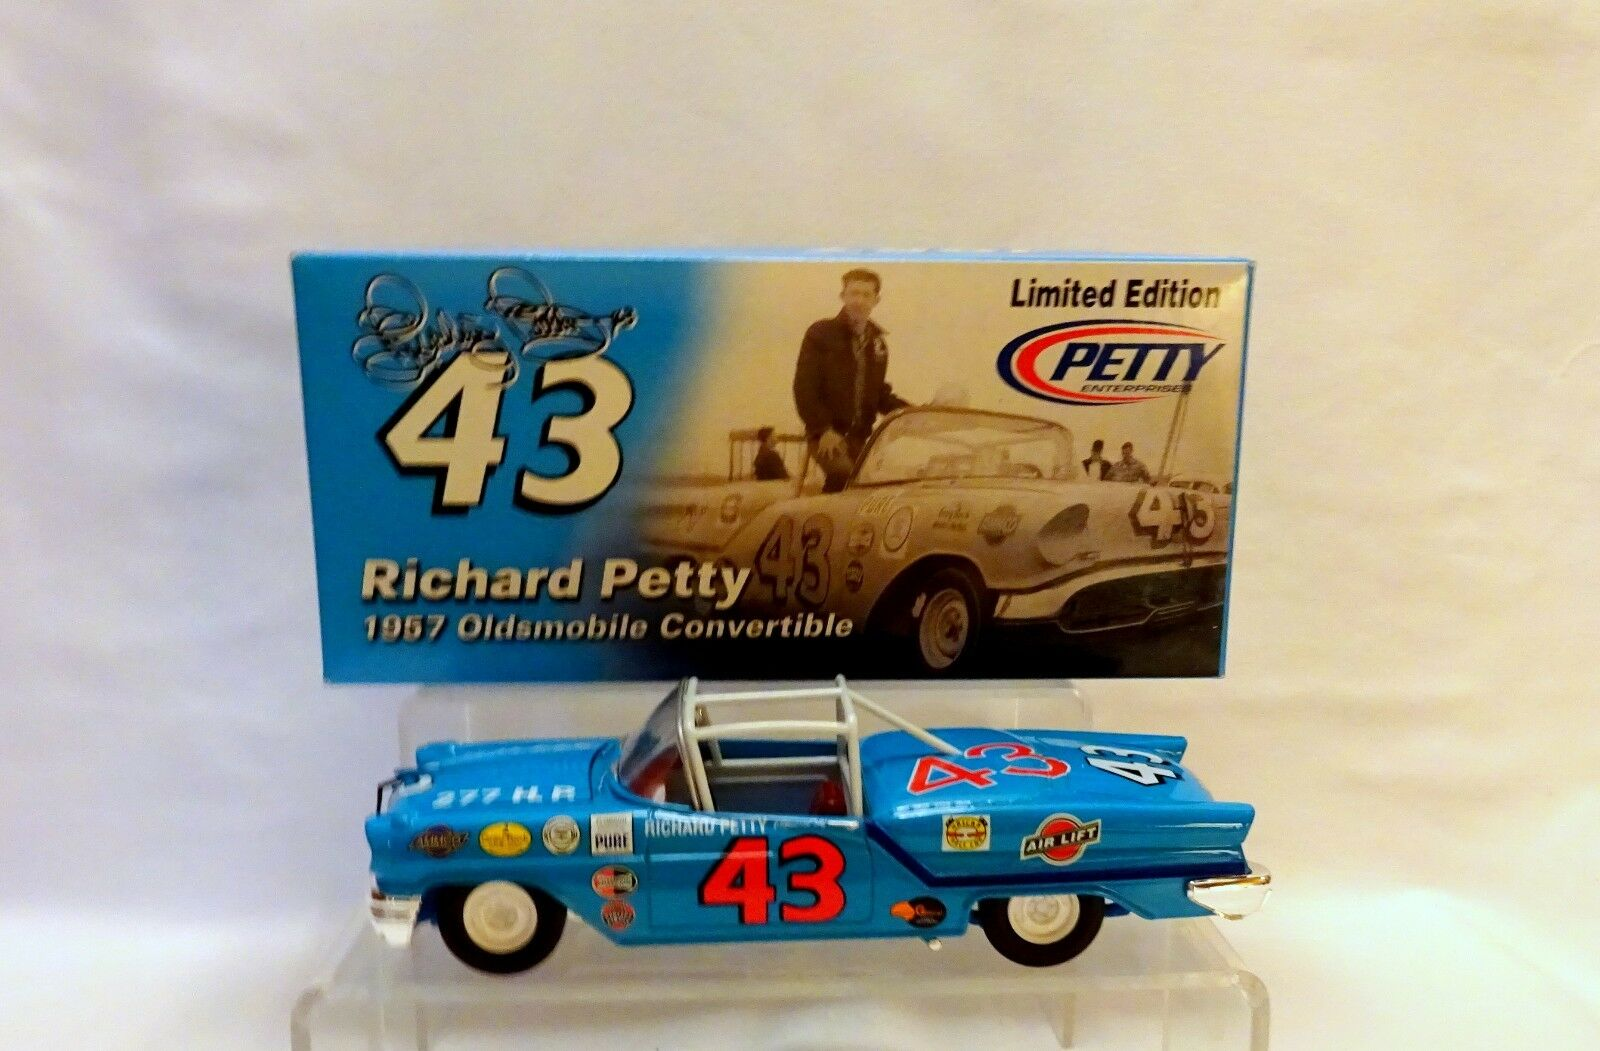 Richard Petty  43 1957 Oldsmobile Converdeible 1 24 scale car Nascar ..... .(79)